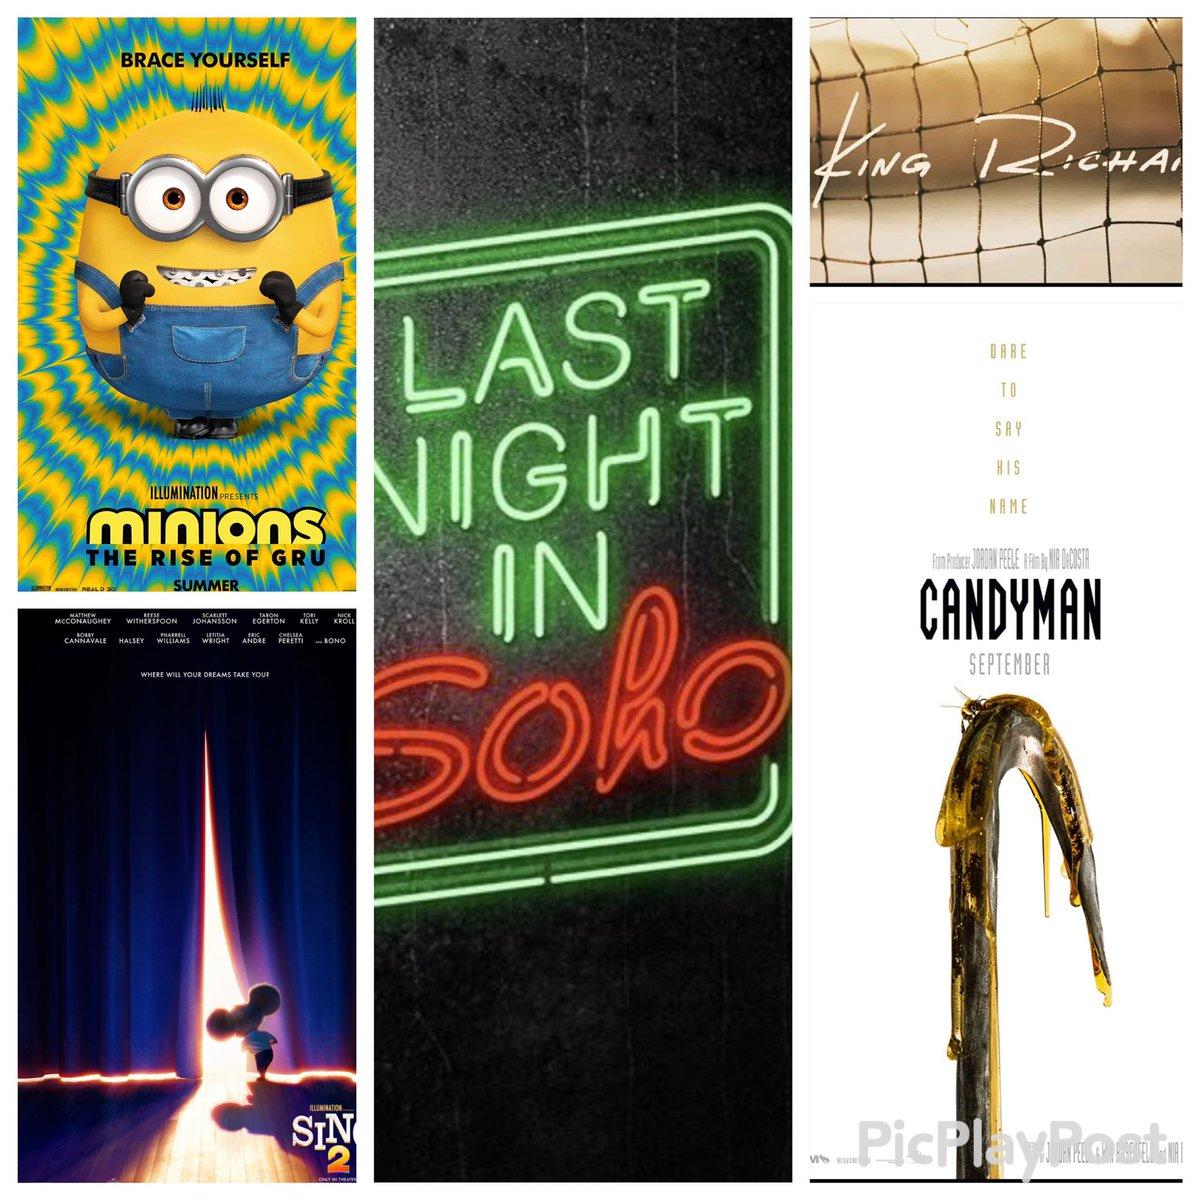 40.- #Minions: The Rise of Gru (Julio) 39.- #KingRichard (Noviembre) 38.- #Sing2 (Diciembre)  37.- #Candyman (Agosto)  36.- #LastNightInSoho (Abril)